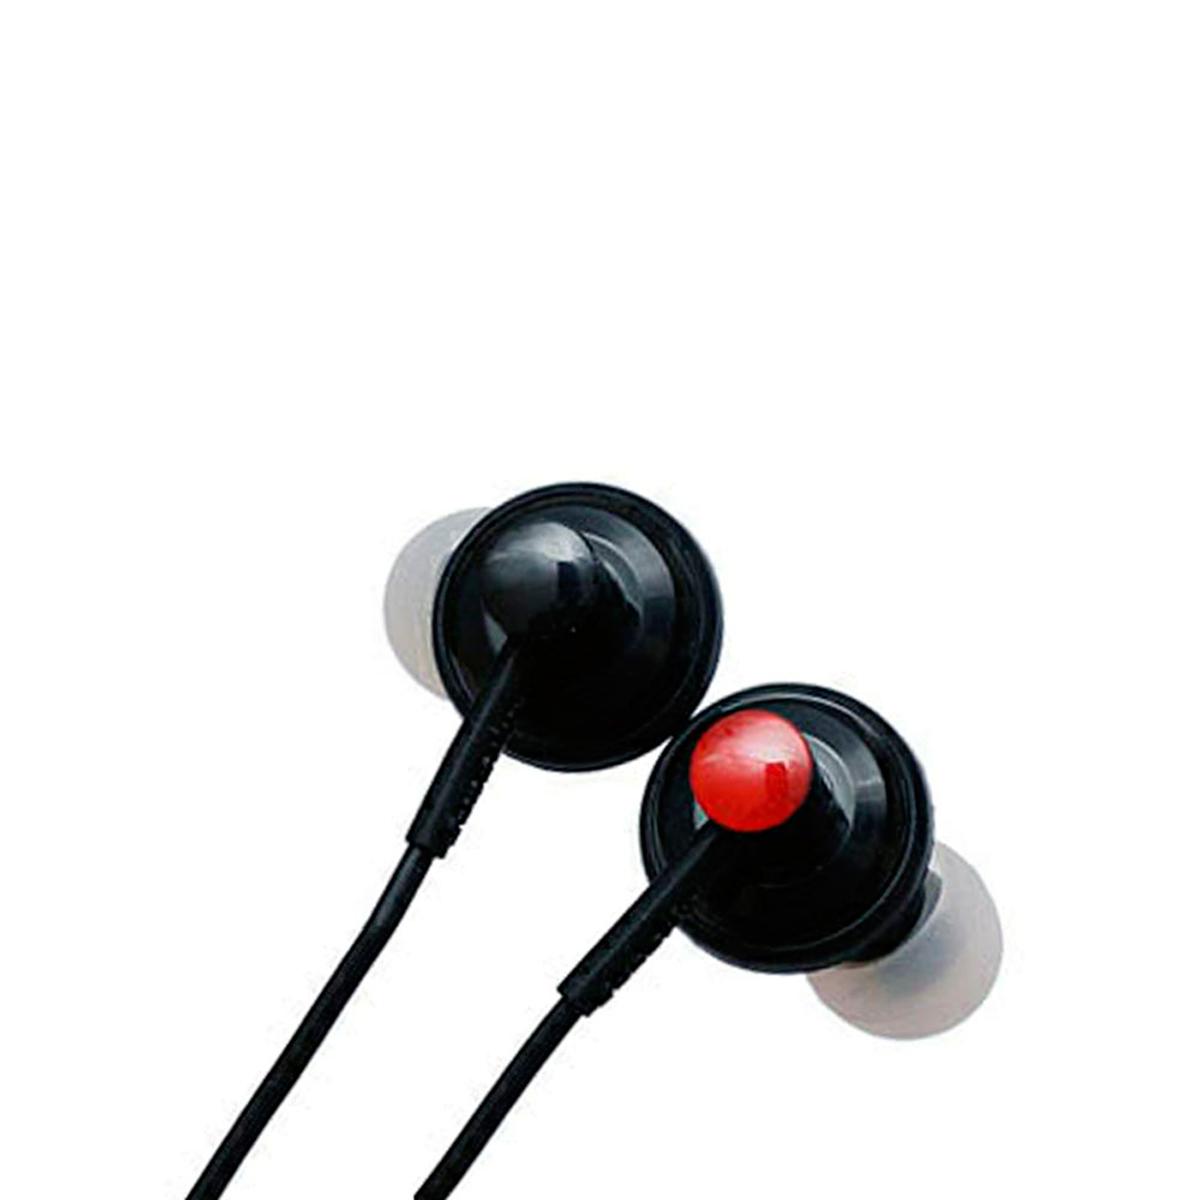 Fone de Ouvido In-ear 20 Hz - 20 Khz 16 Ohms p/ Retorno de Bandas - HD 381 Superlux